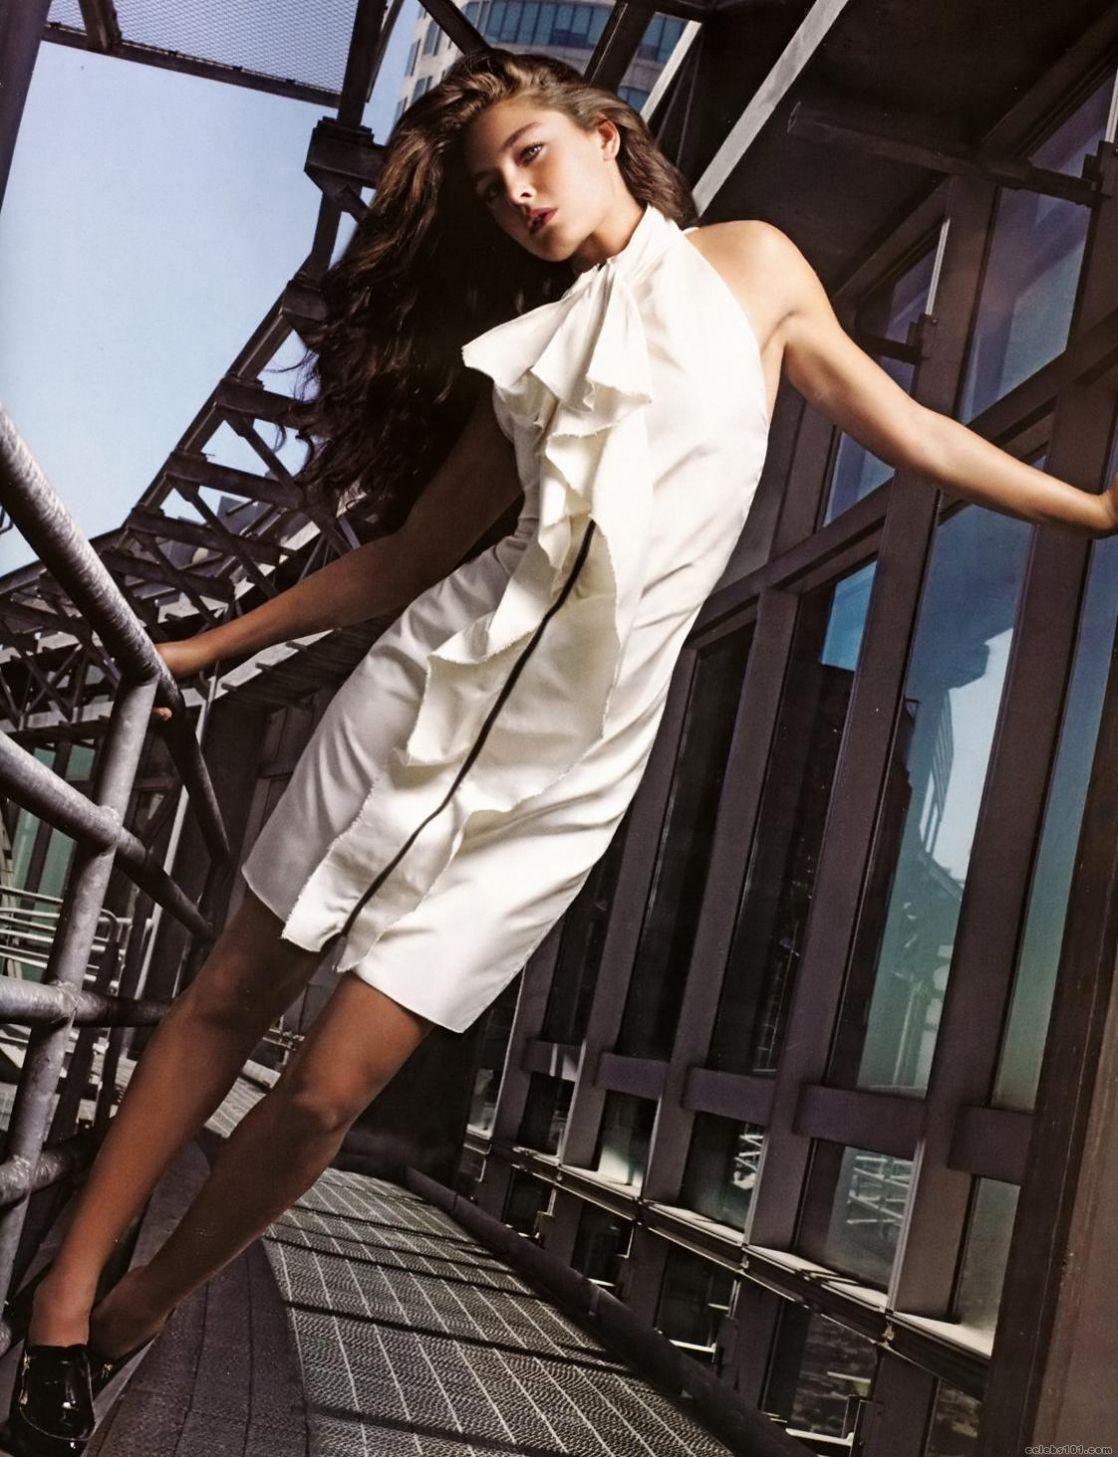 Alexa Davalos | Alexa davalos, Perfect woman, Model